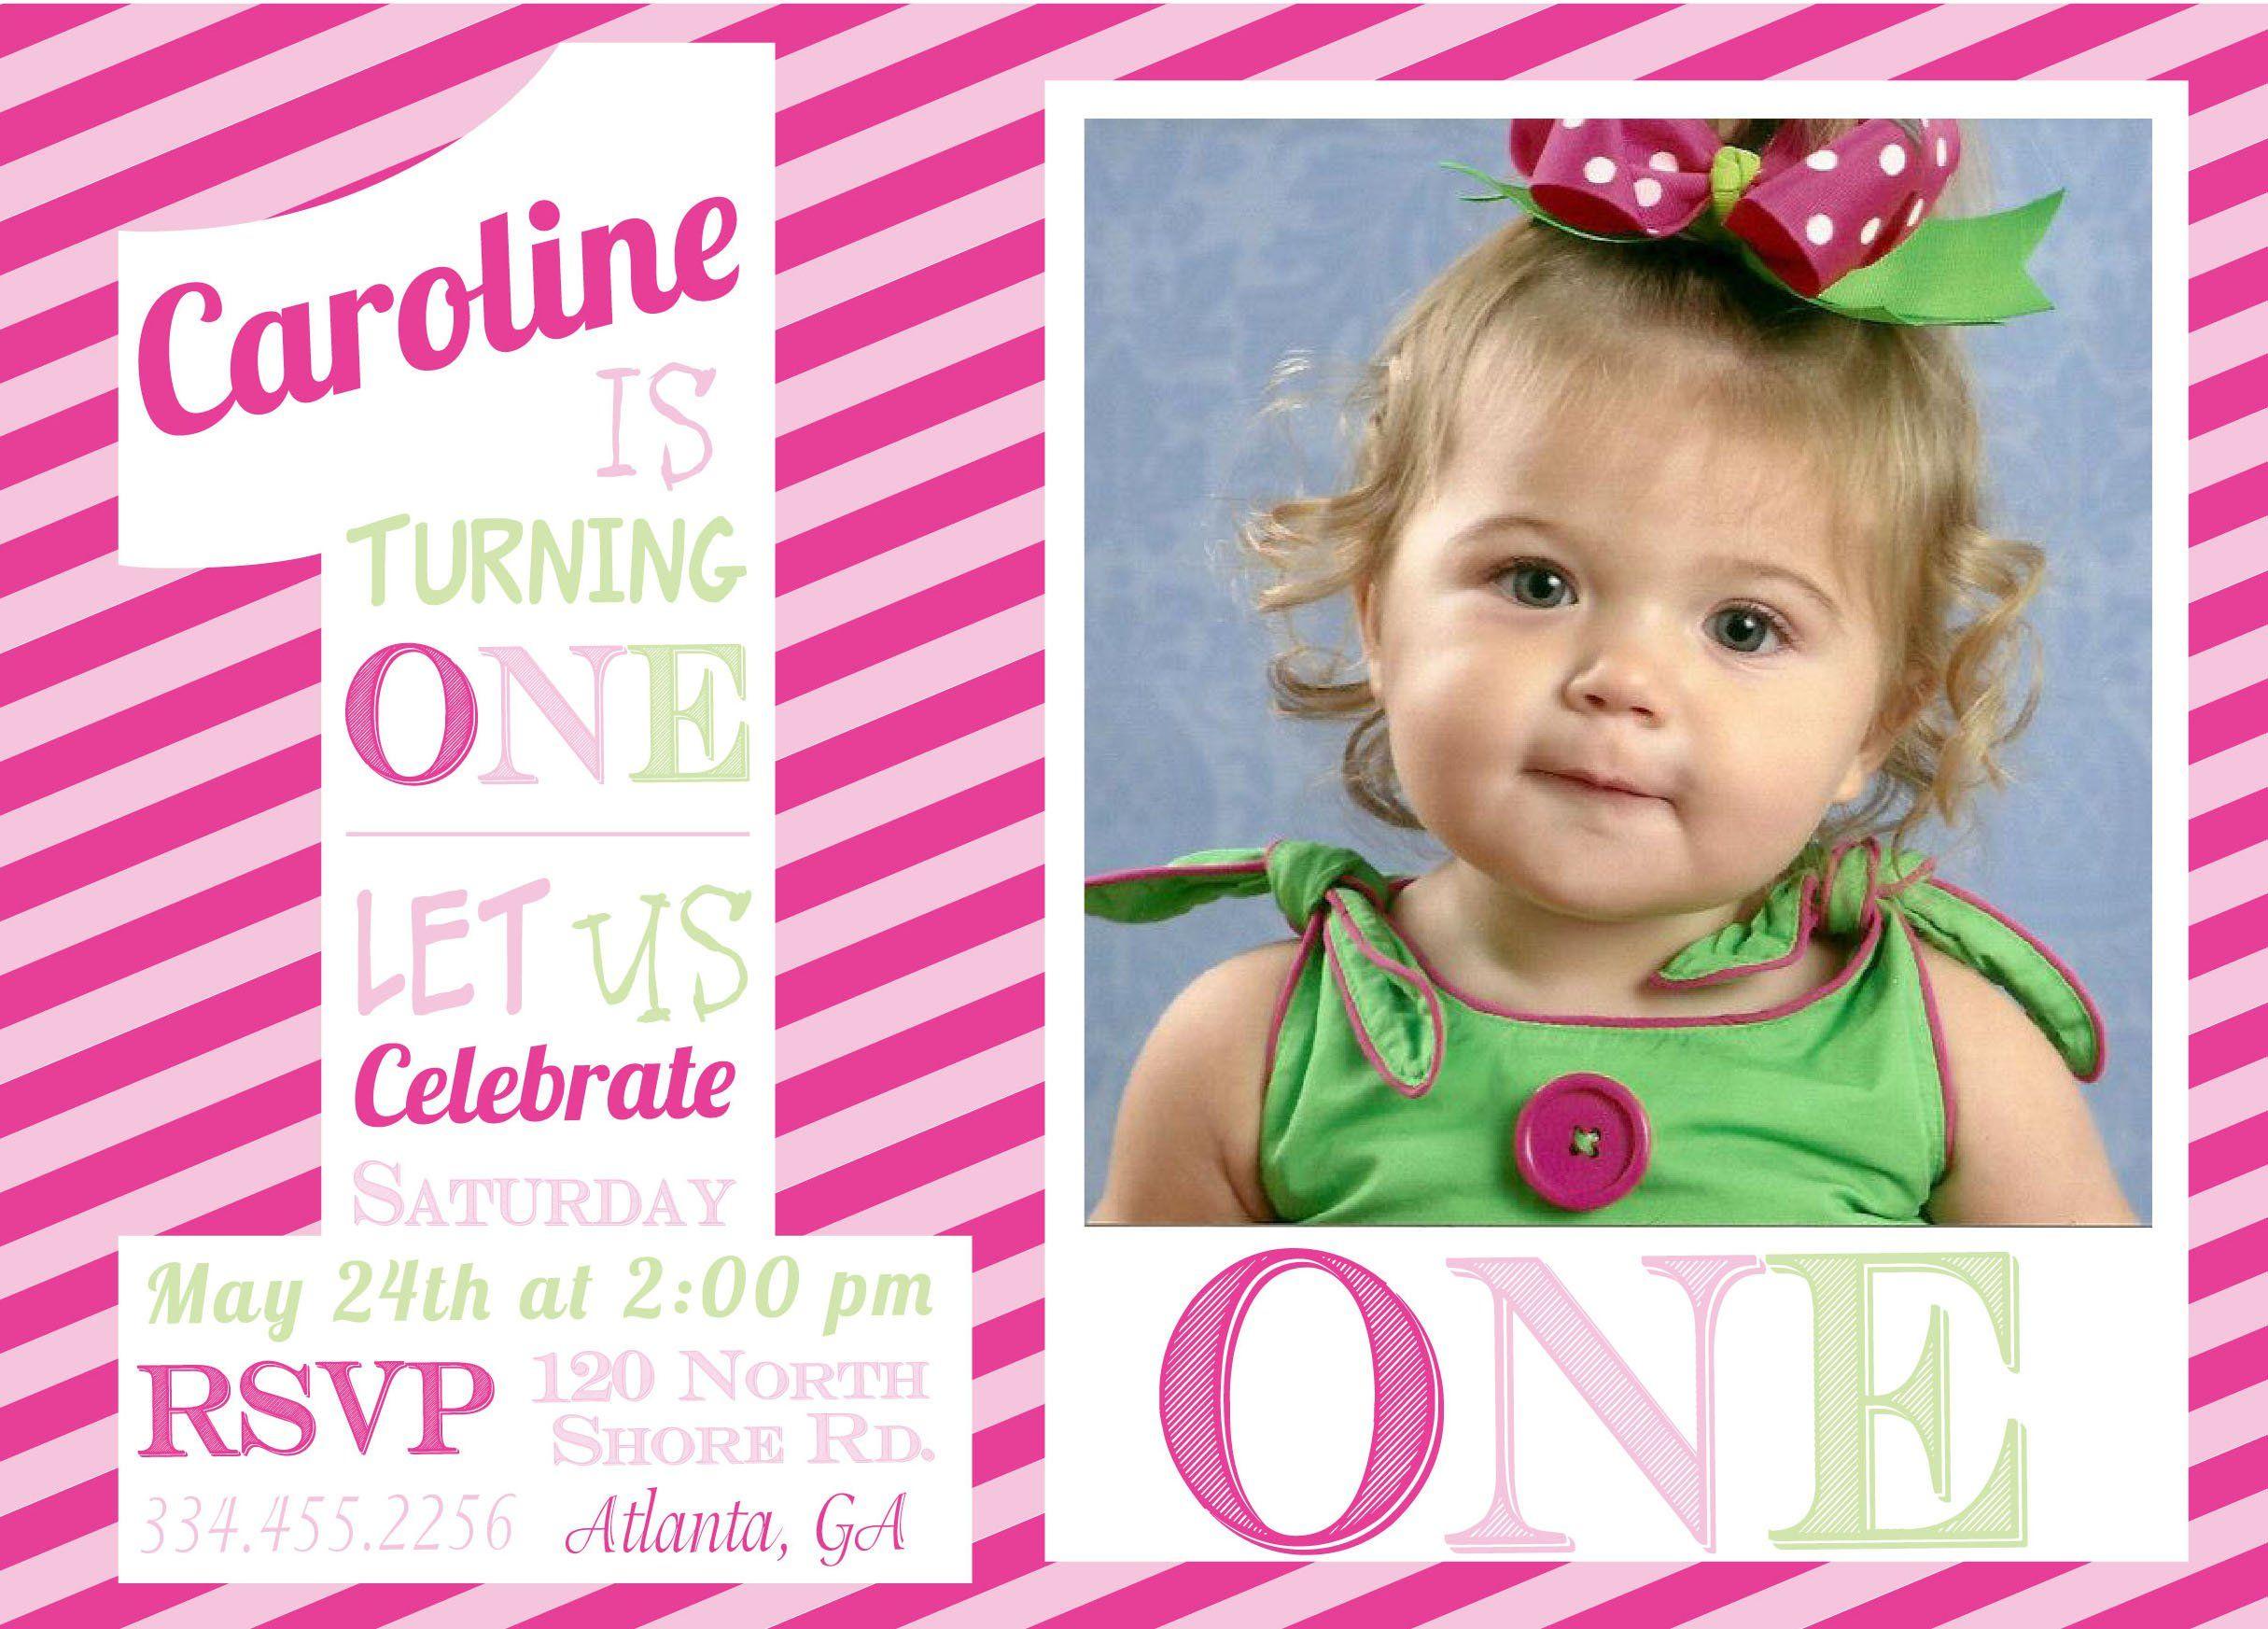 birthday invitations : 1st birthday invitations - Invitations Design ...